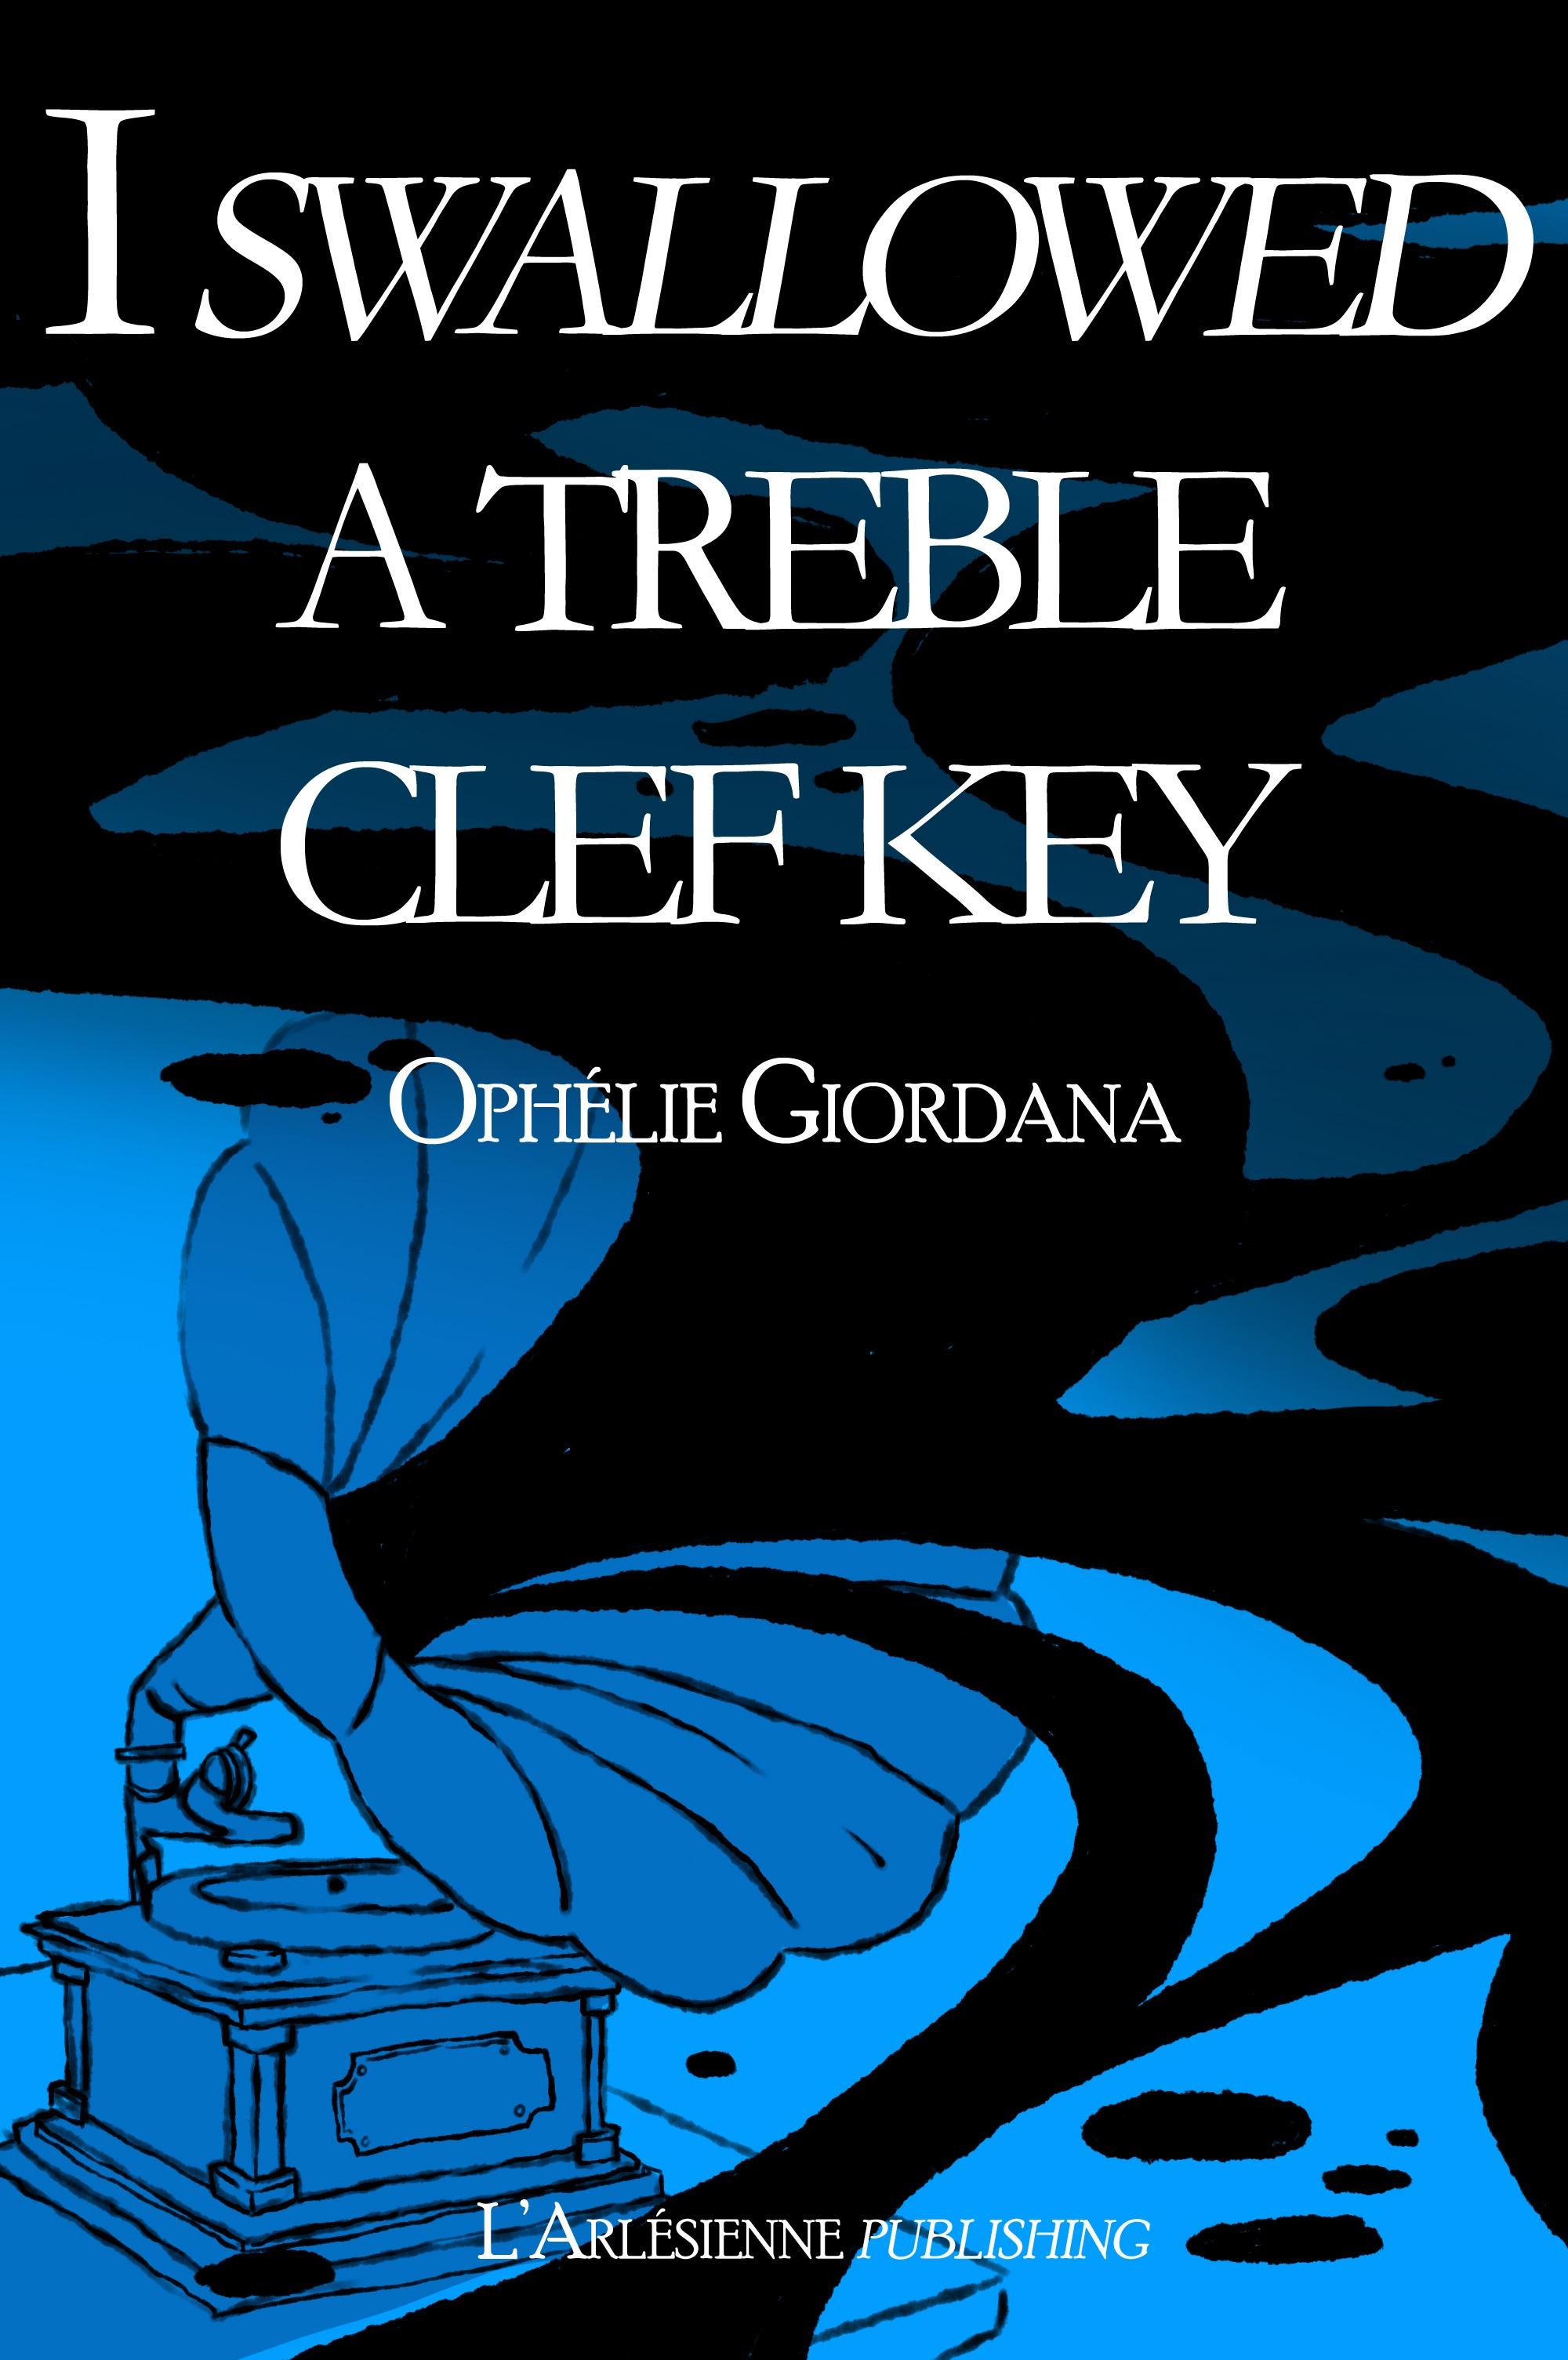 I swallowed a treble clef key